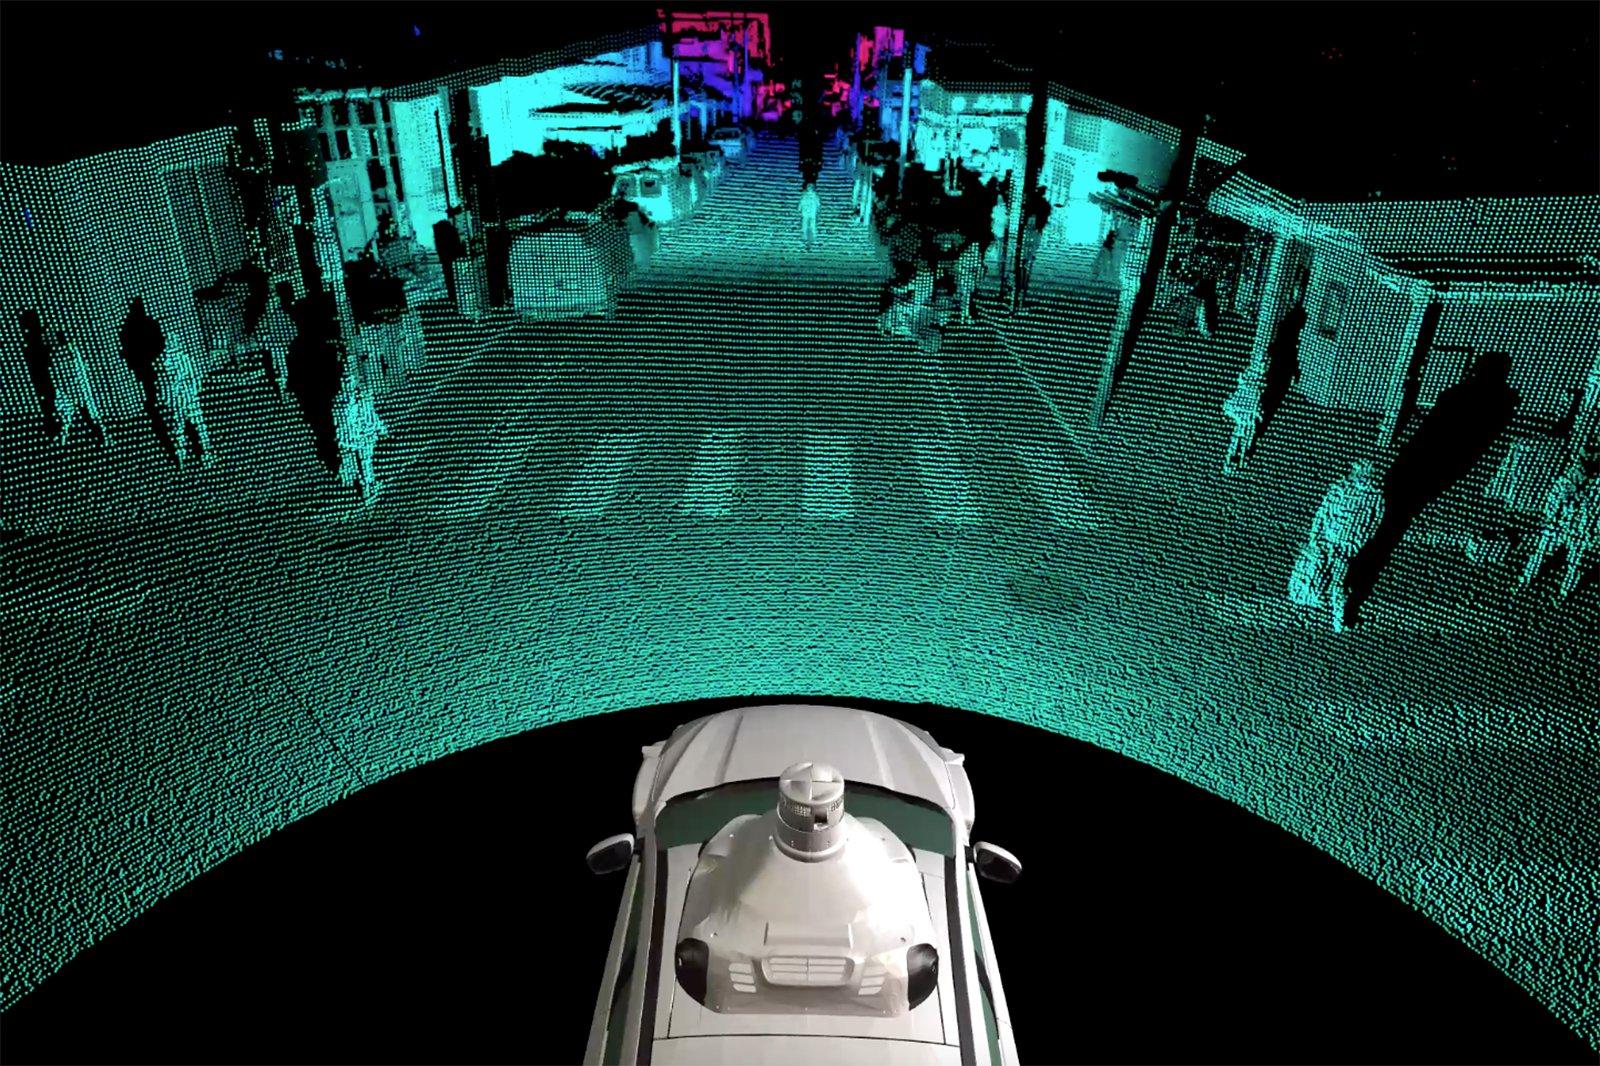 VW Argo AI LIDAR